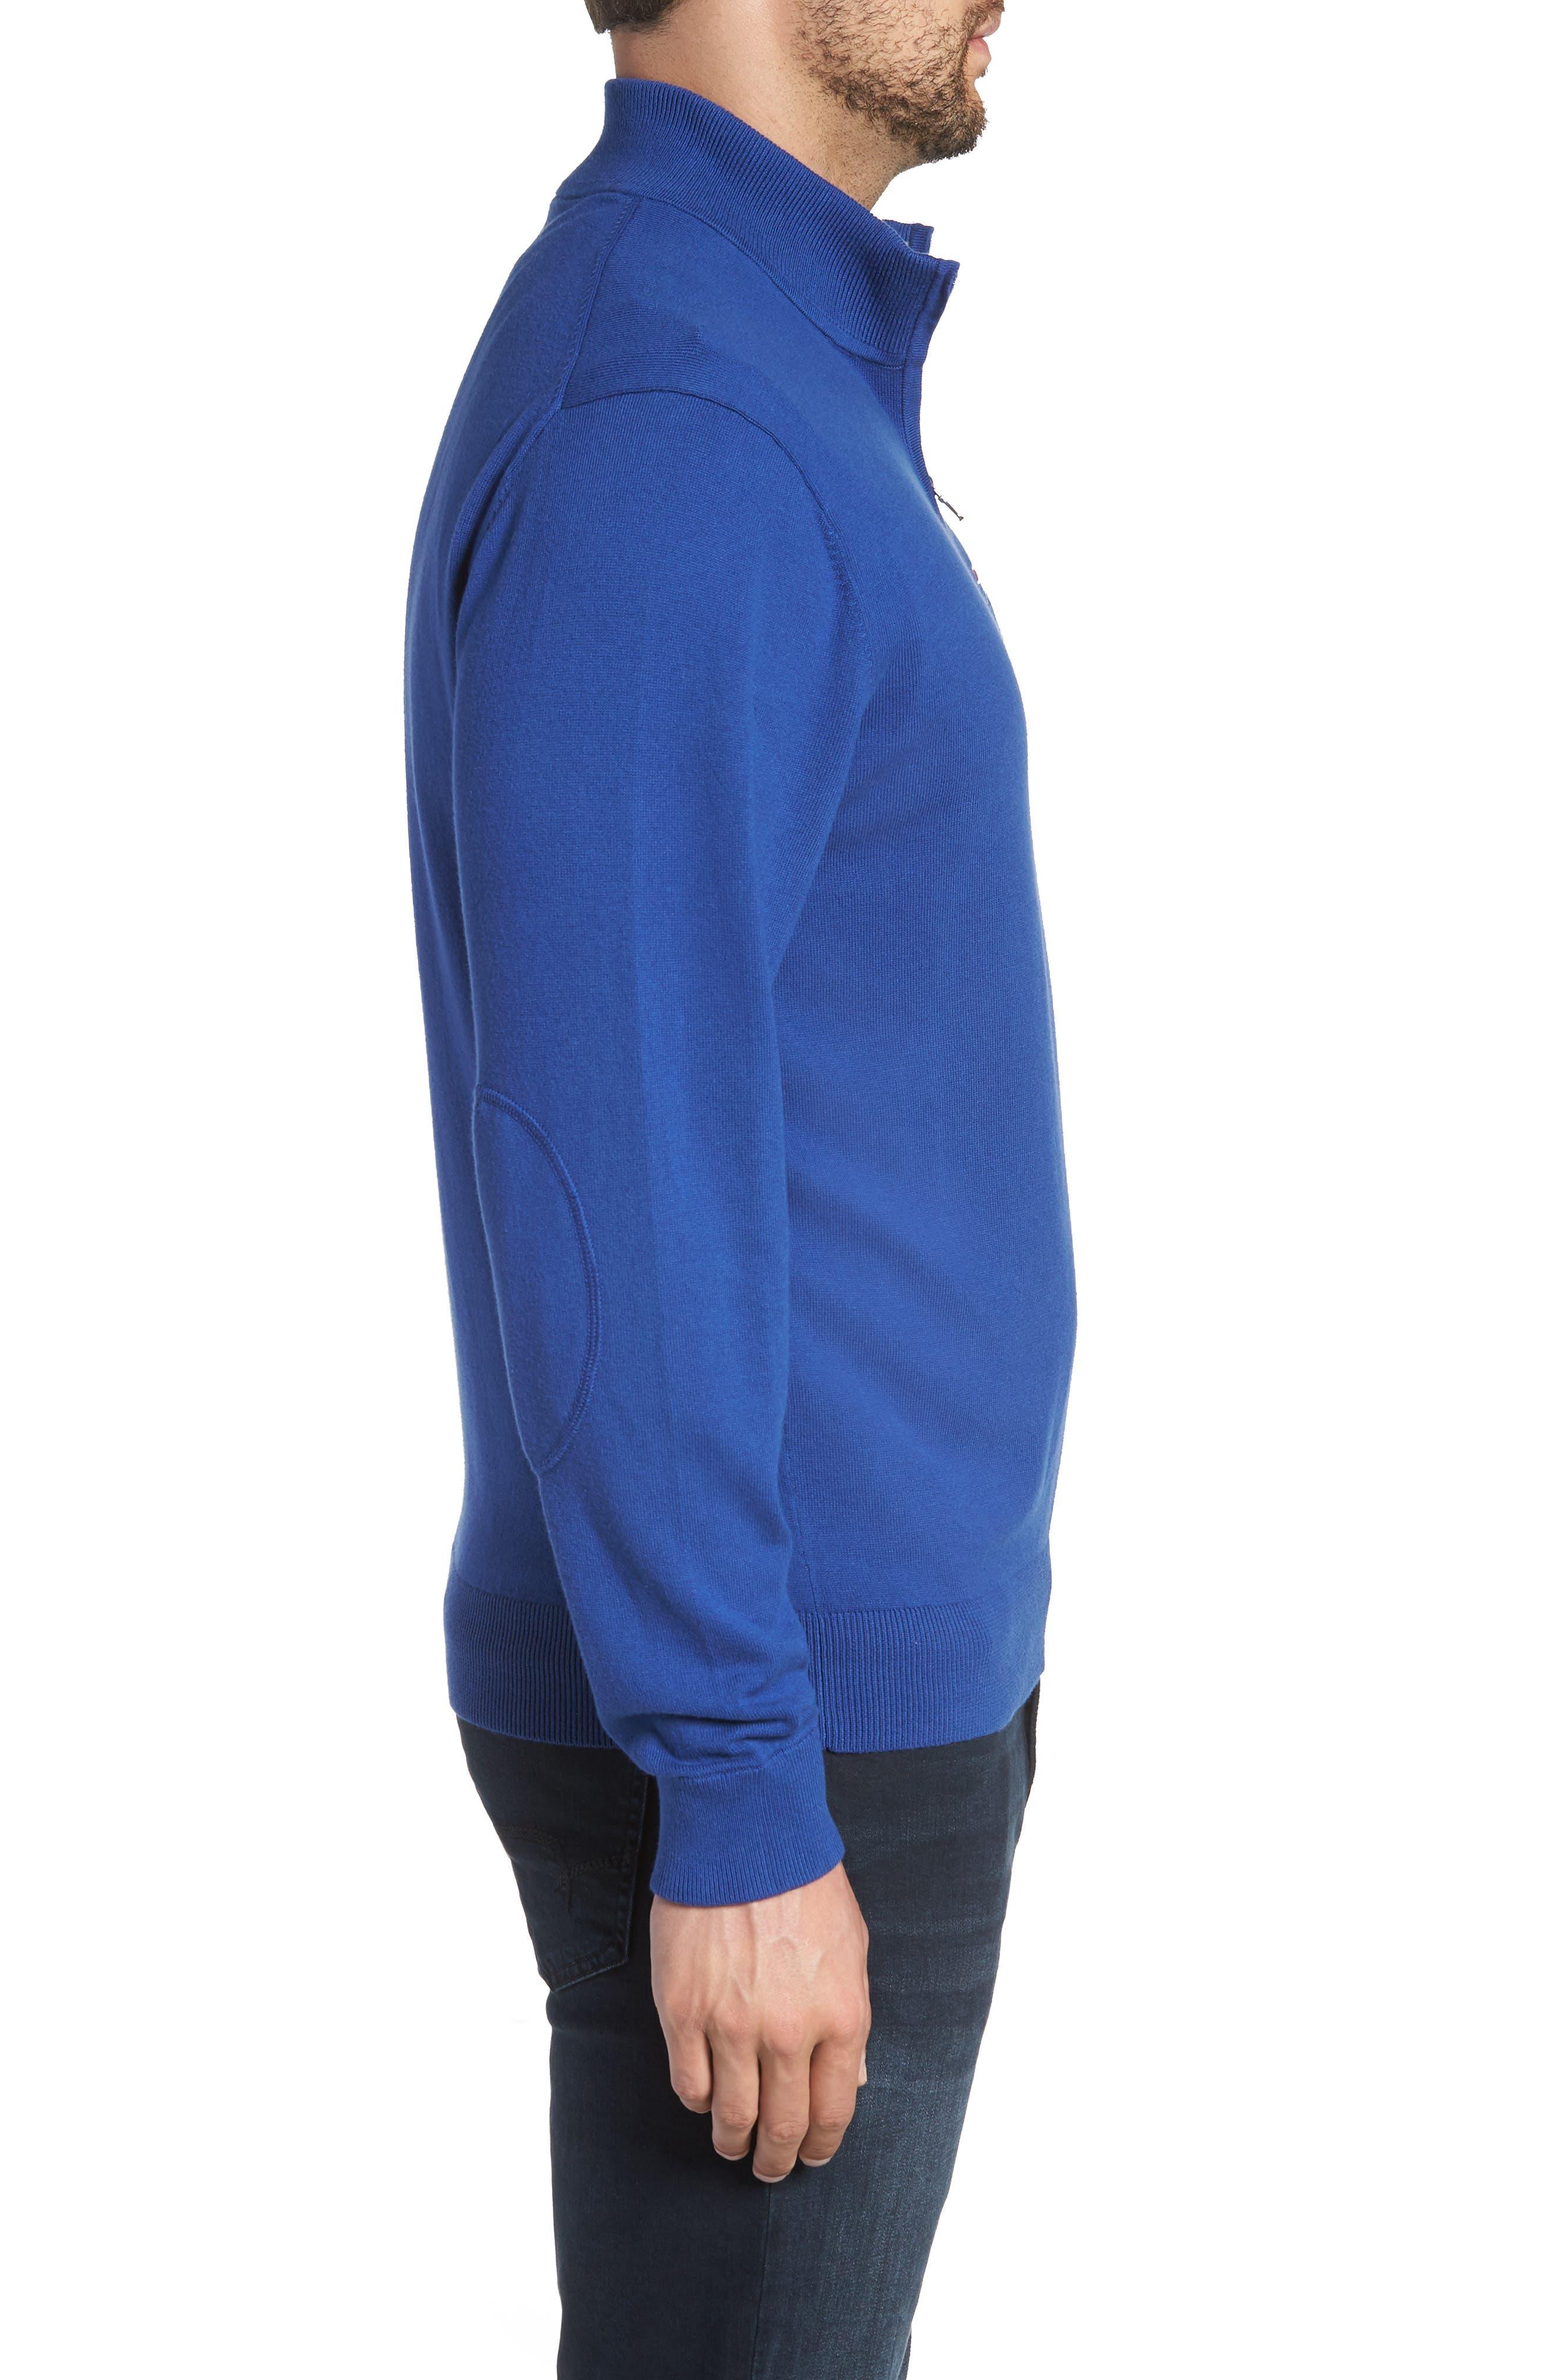 Buffalo Bills - Lakemont Regular Fit Quarter Zip Sweater,                             Alternate thumbnail 3, color,                             TOUR BLUE